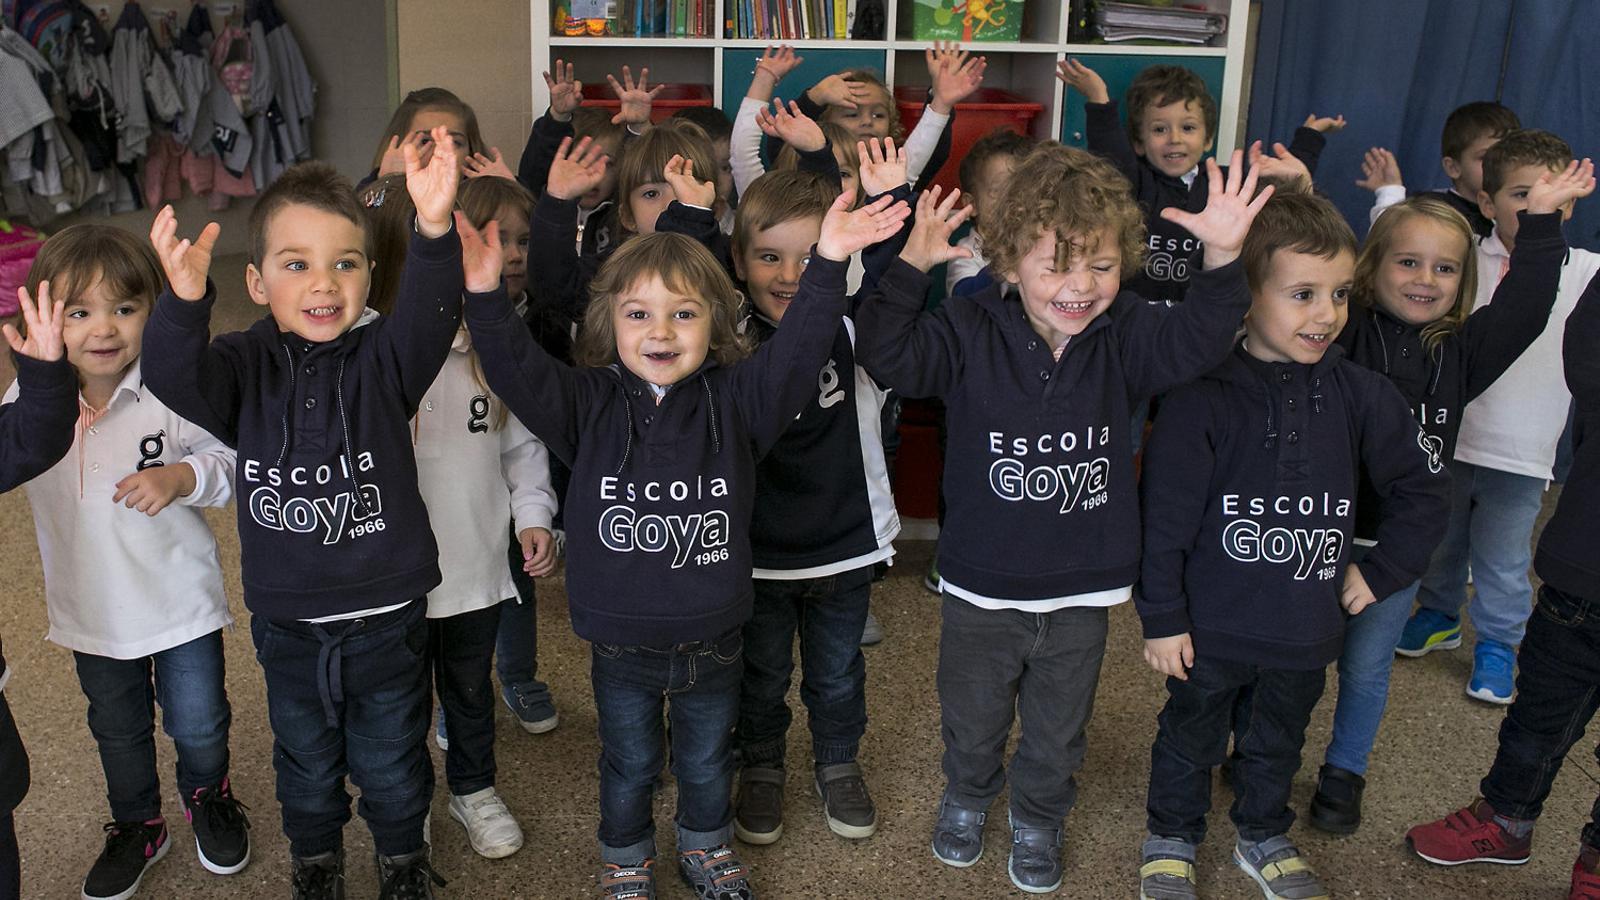 Un escola de Terrassa implanta un uniforme unisex